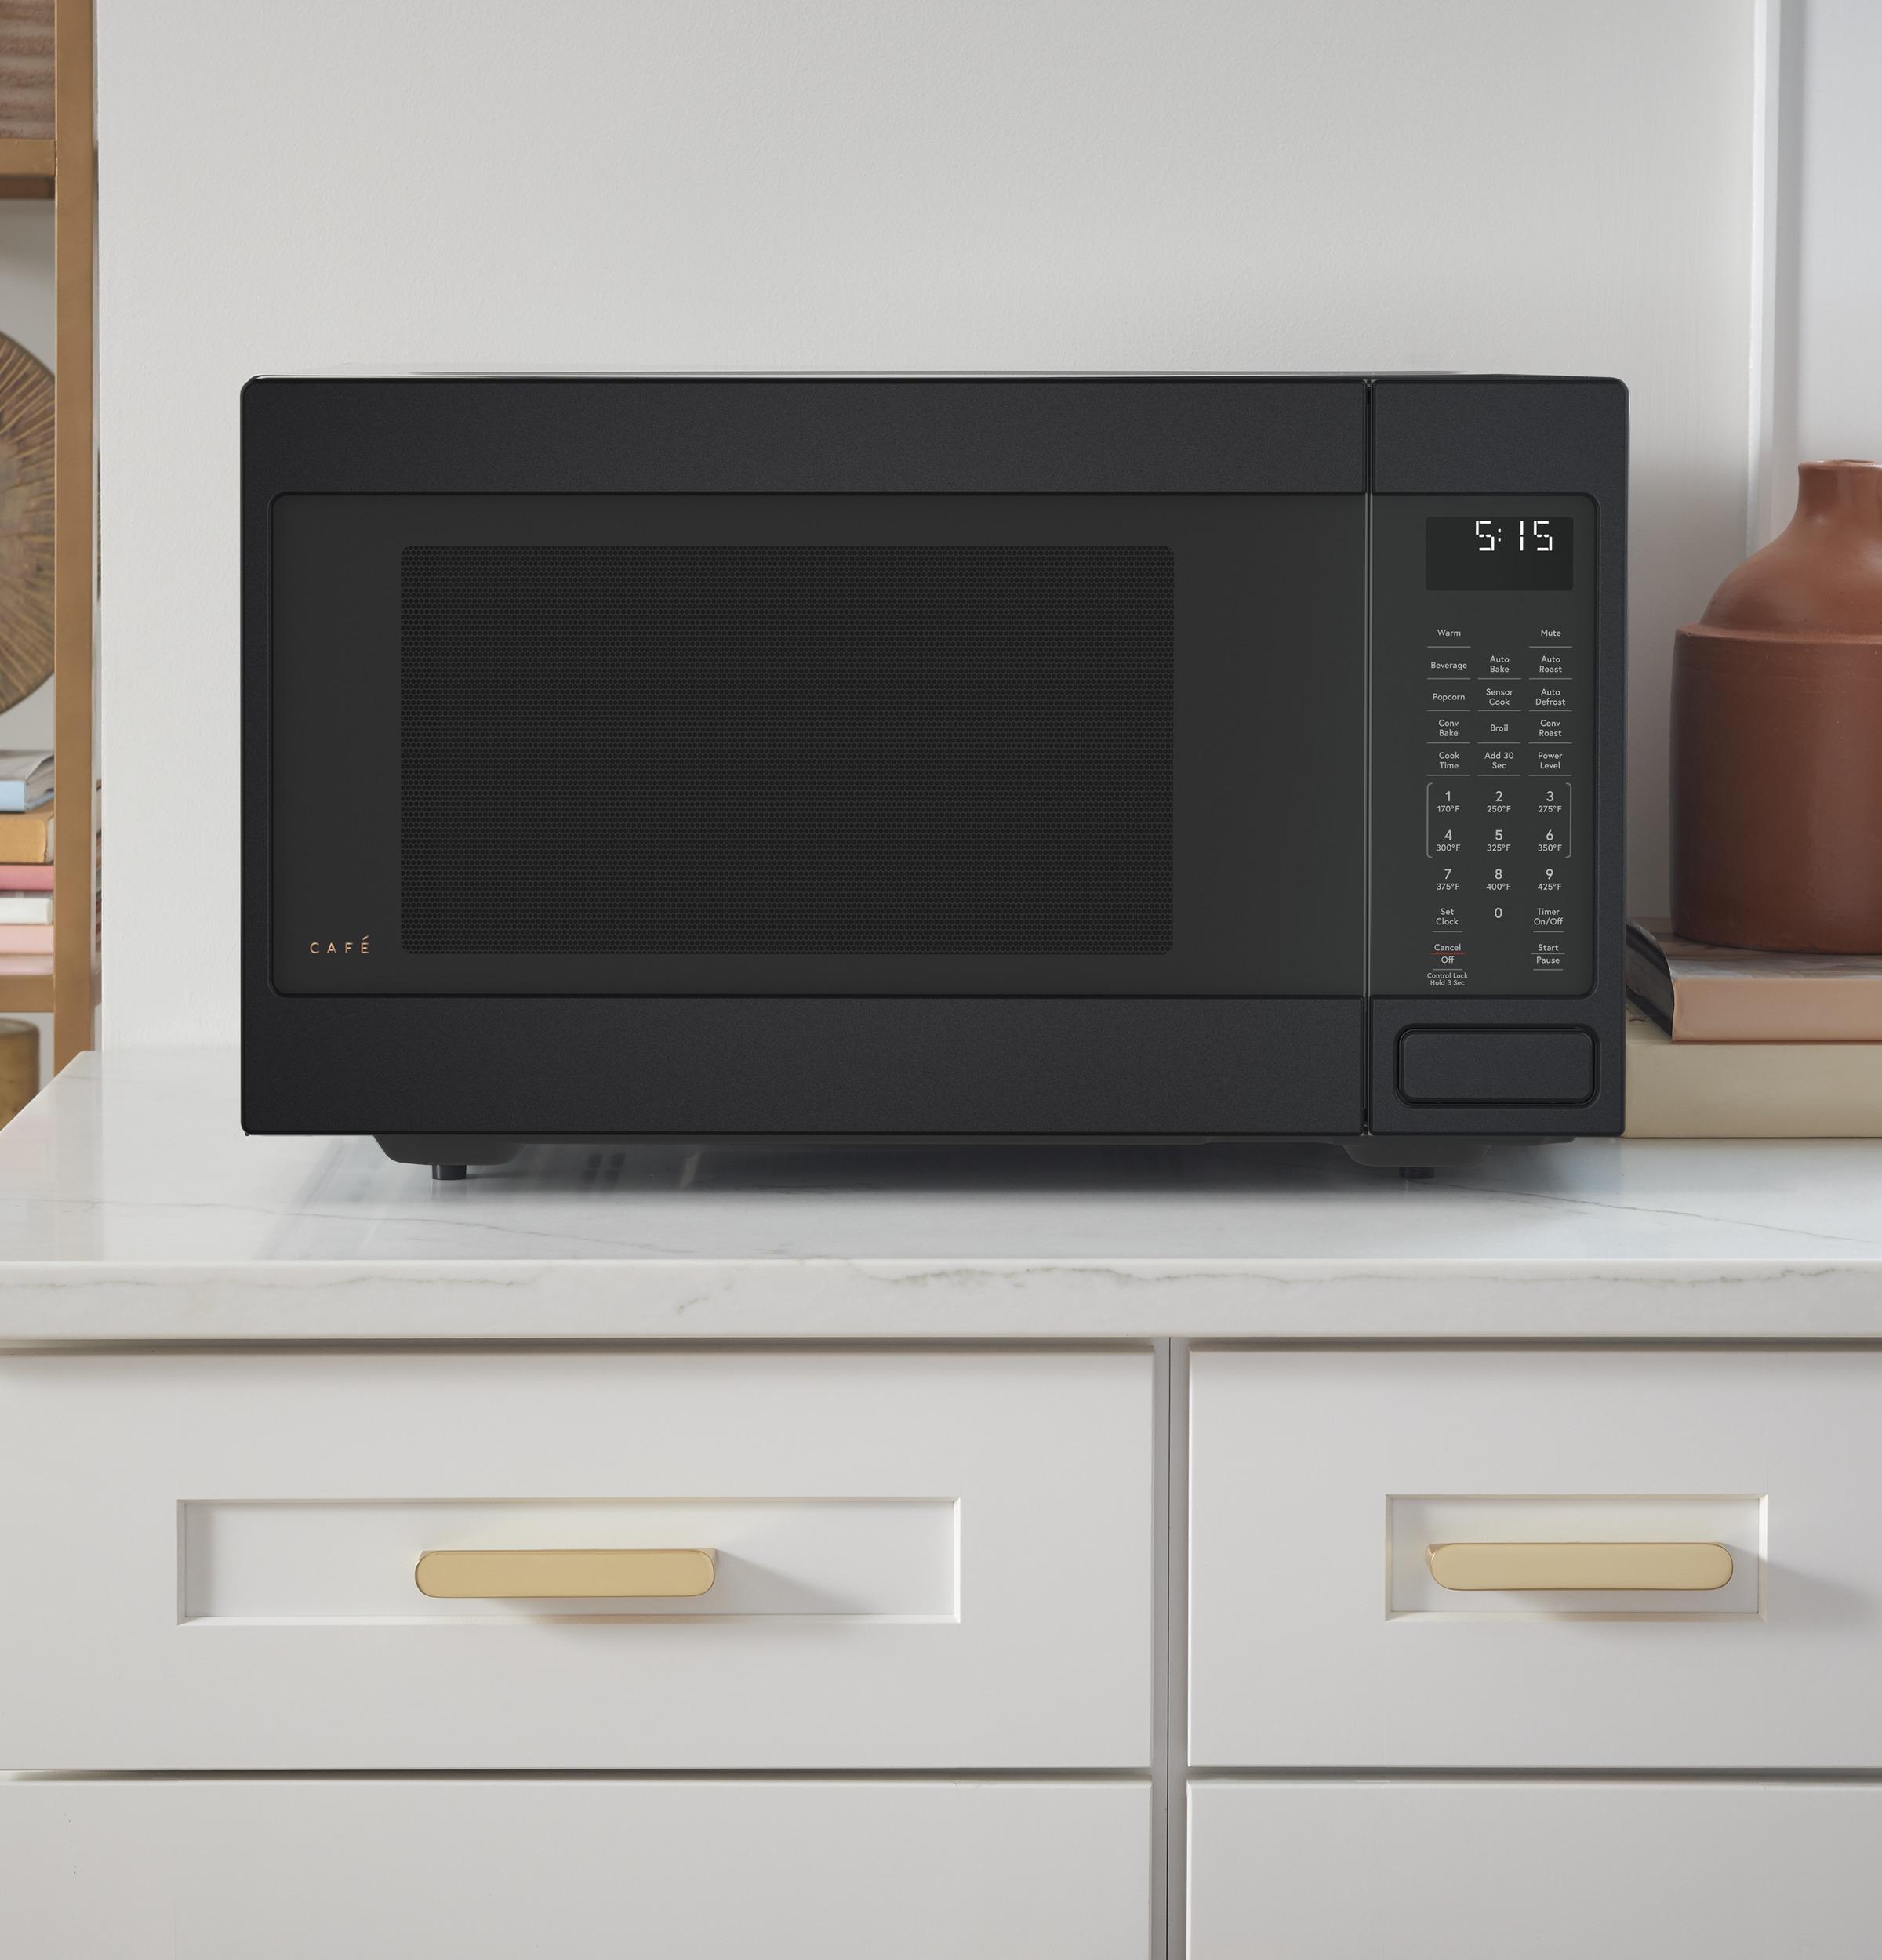 Model: CEB515P3MDS | Café™ 1.5 Cu. Ft. Countertop Convection/Microwave Oven